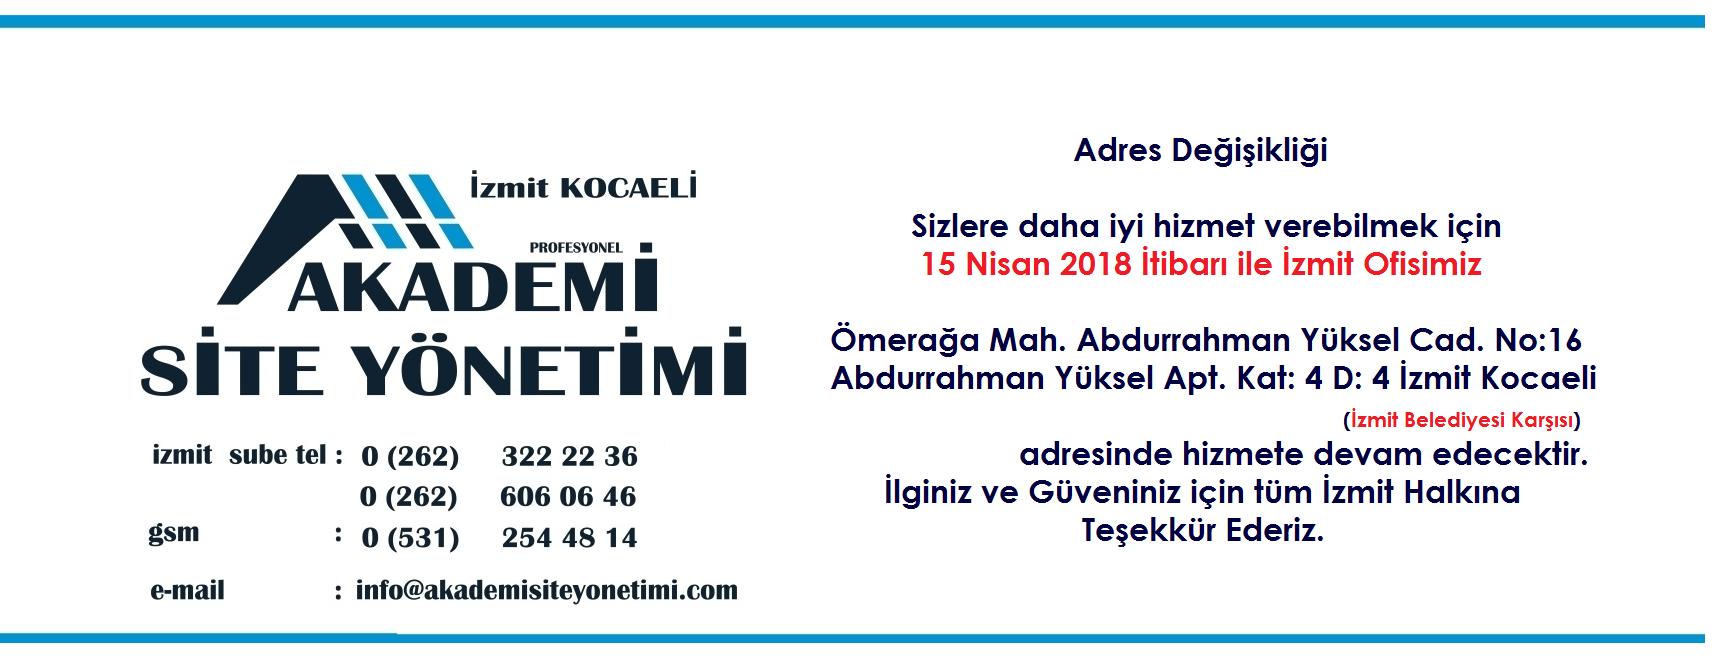 Akademi Profesyonel Site Yonetimi, İzmit Site Yonetimi, Kocaeli Site Yonetimi